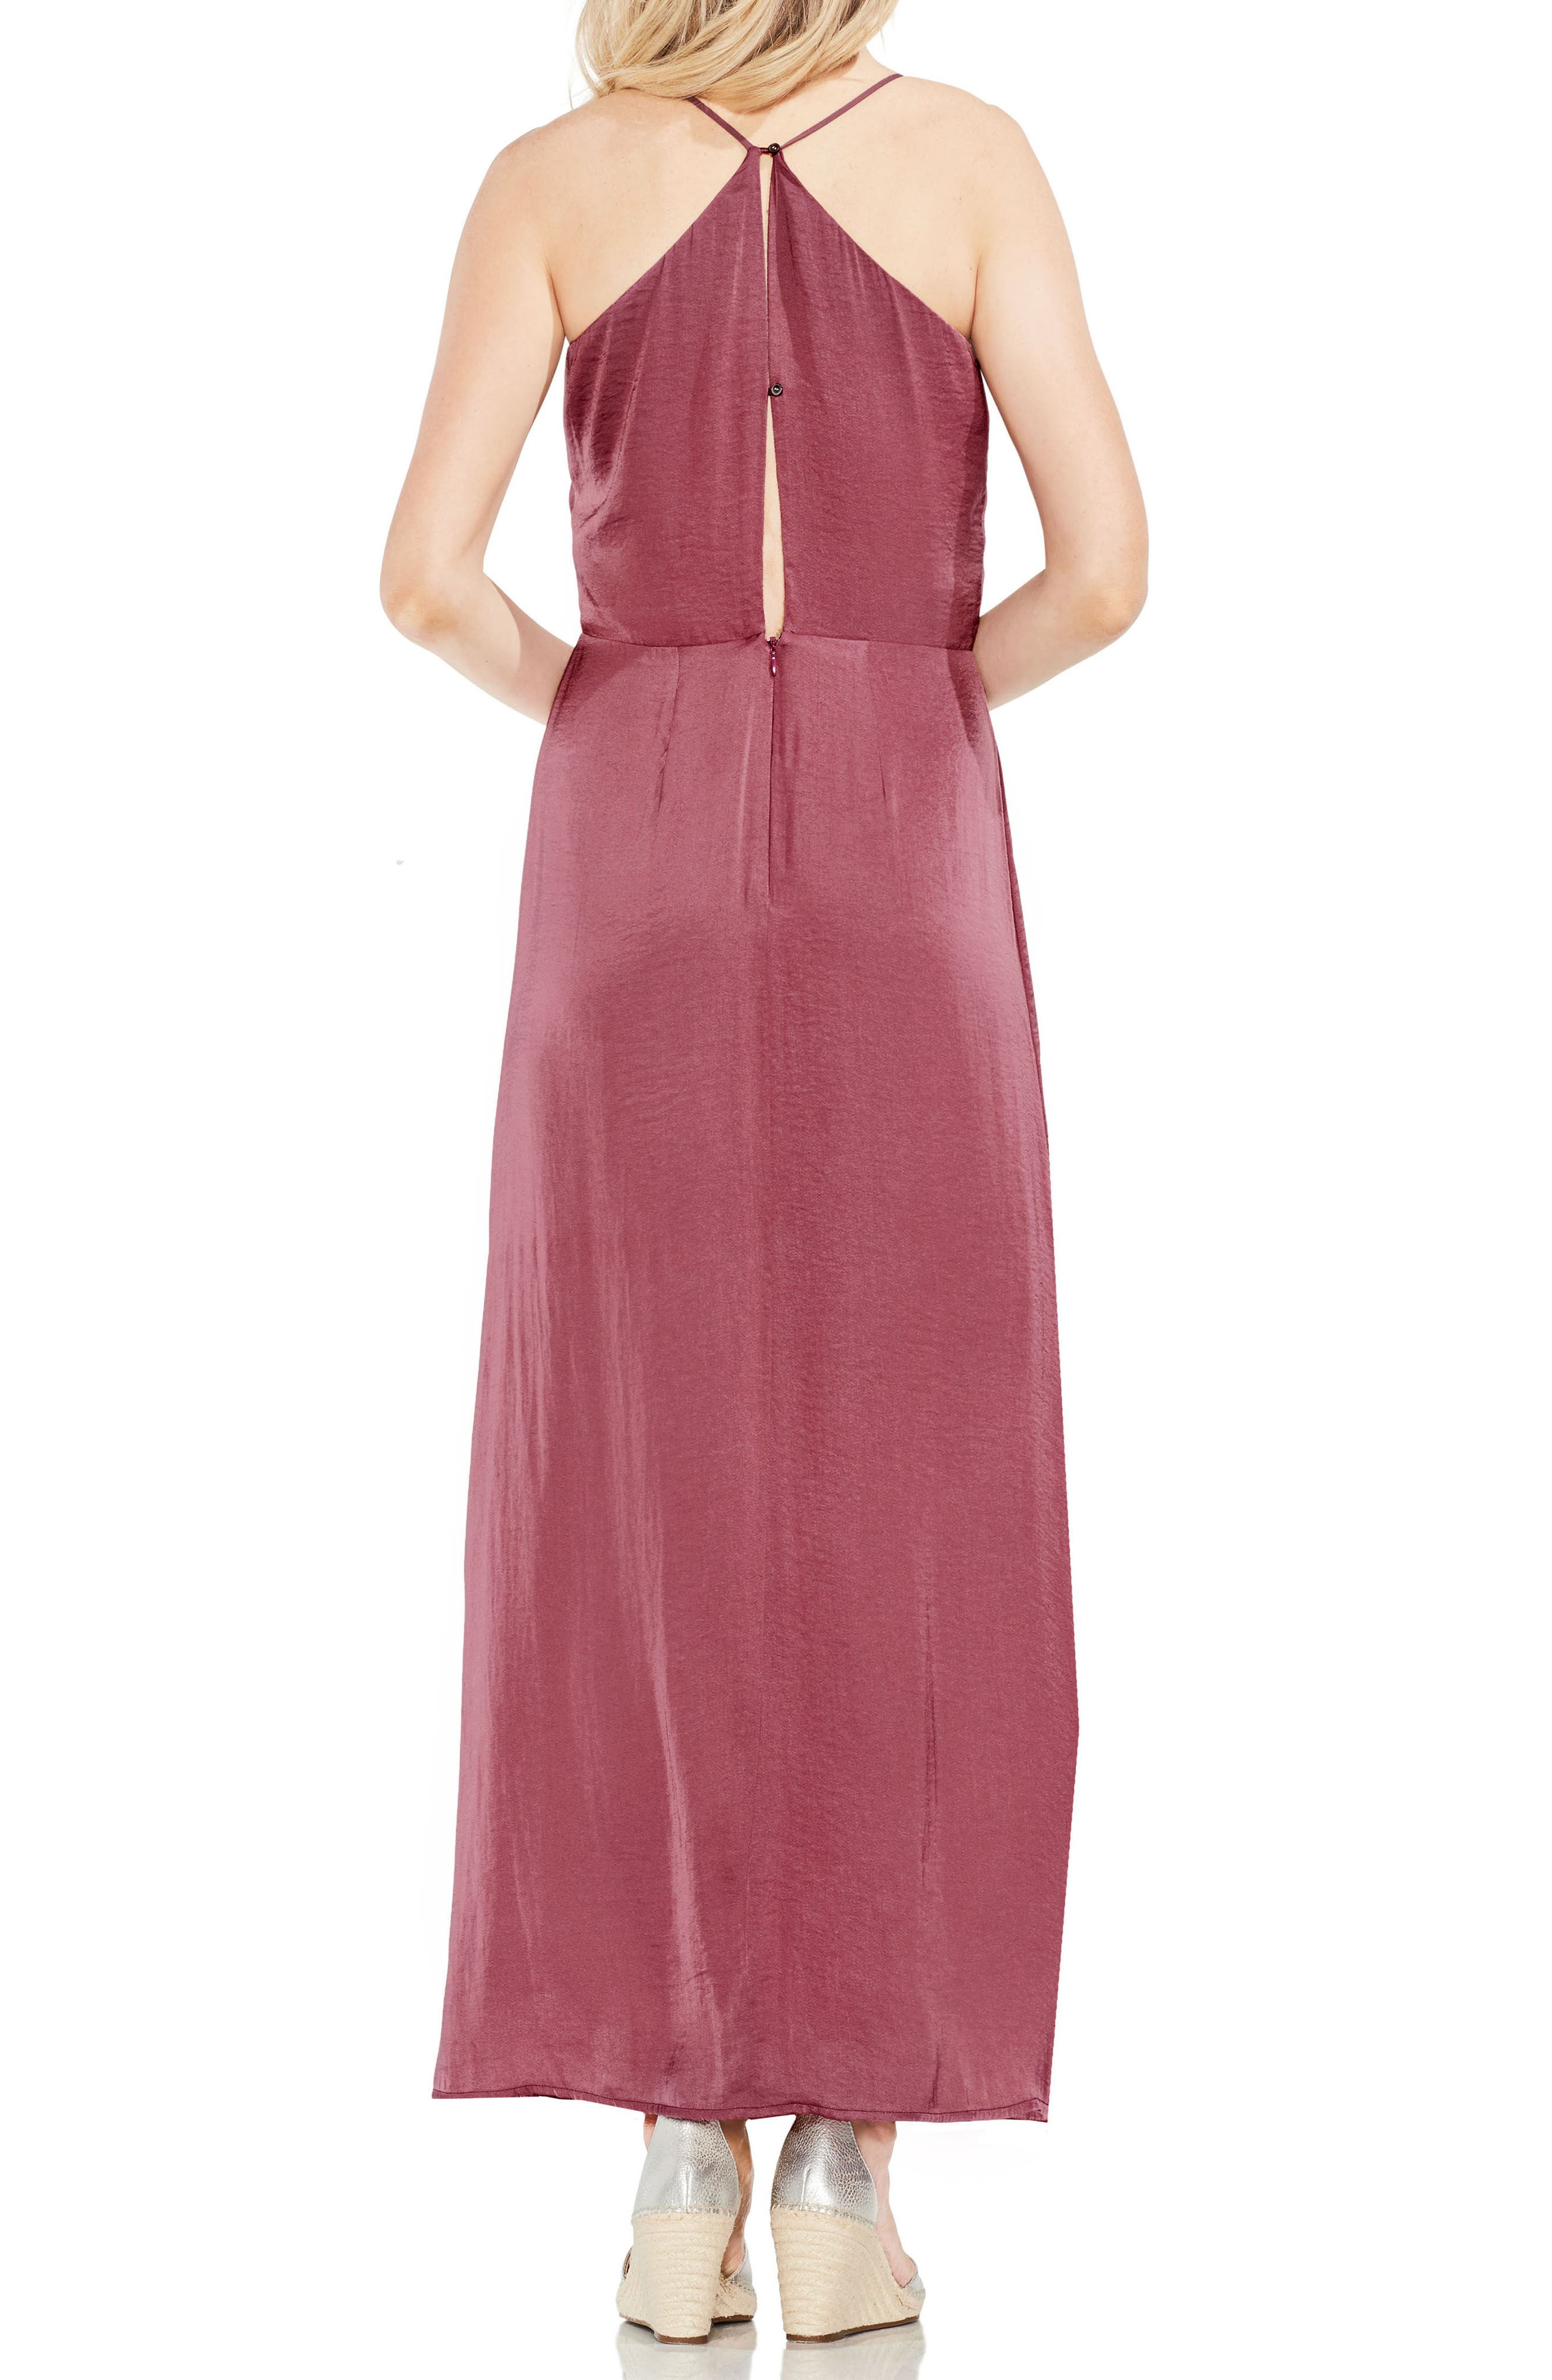 Hammered Satin Wrap Front Maxi Dress,                             Alternate thumbnail 2, color,                             Summer Rose